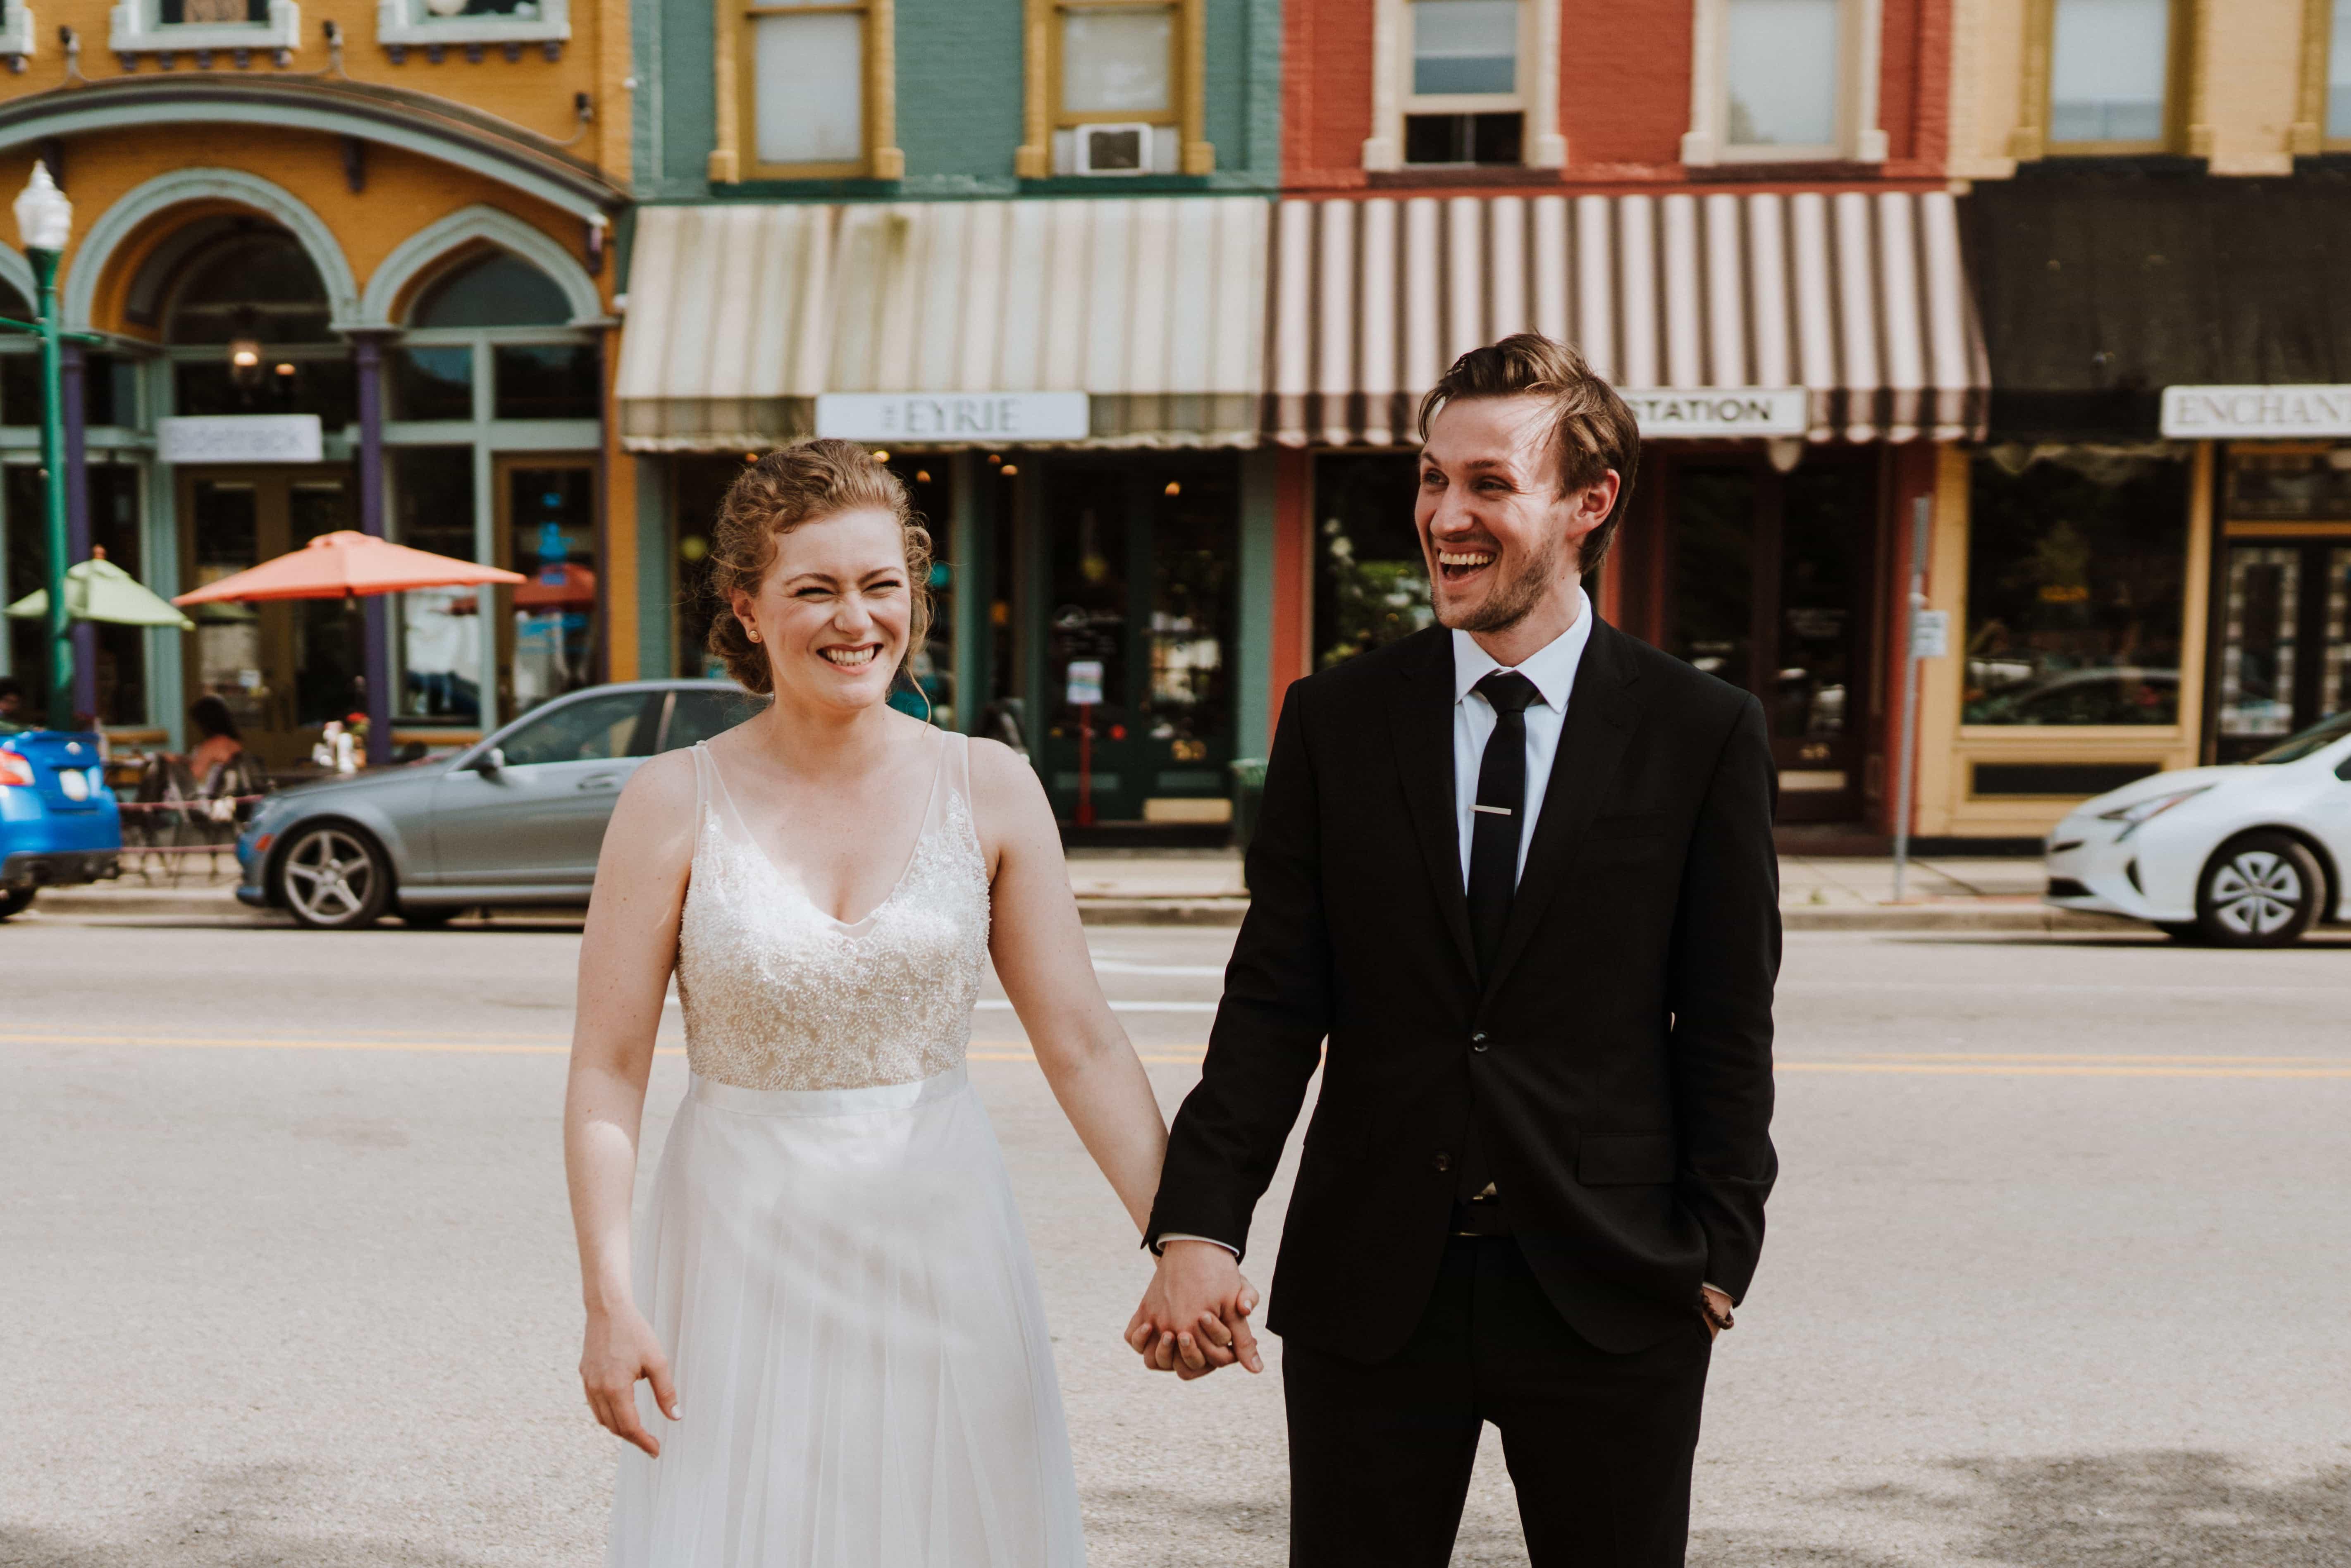 Ypsilanti Freighthouse Wedding | Abby & Malcolm